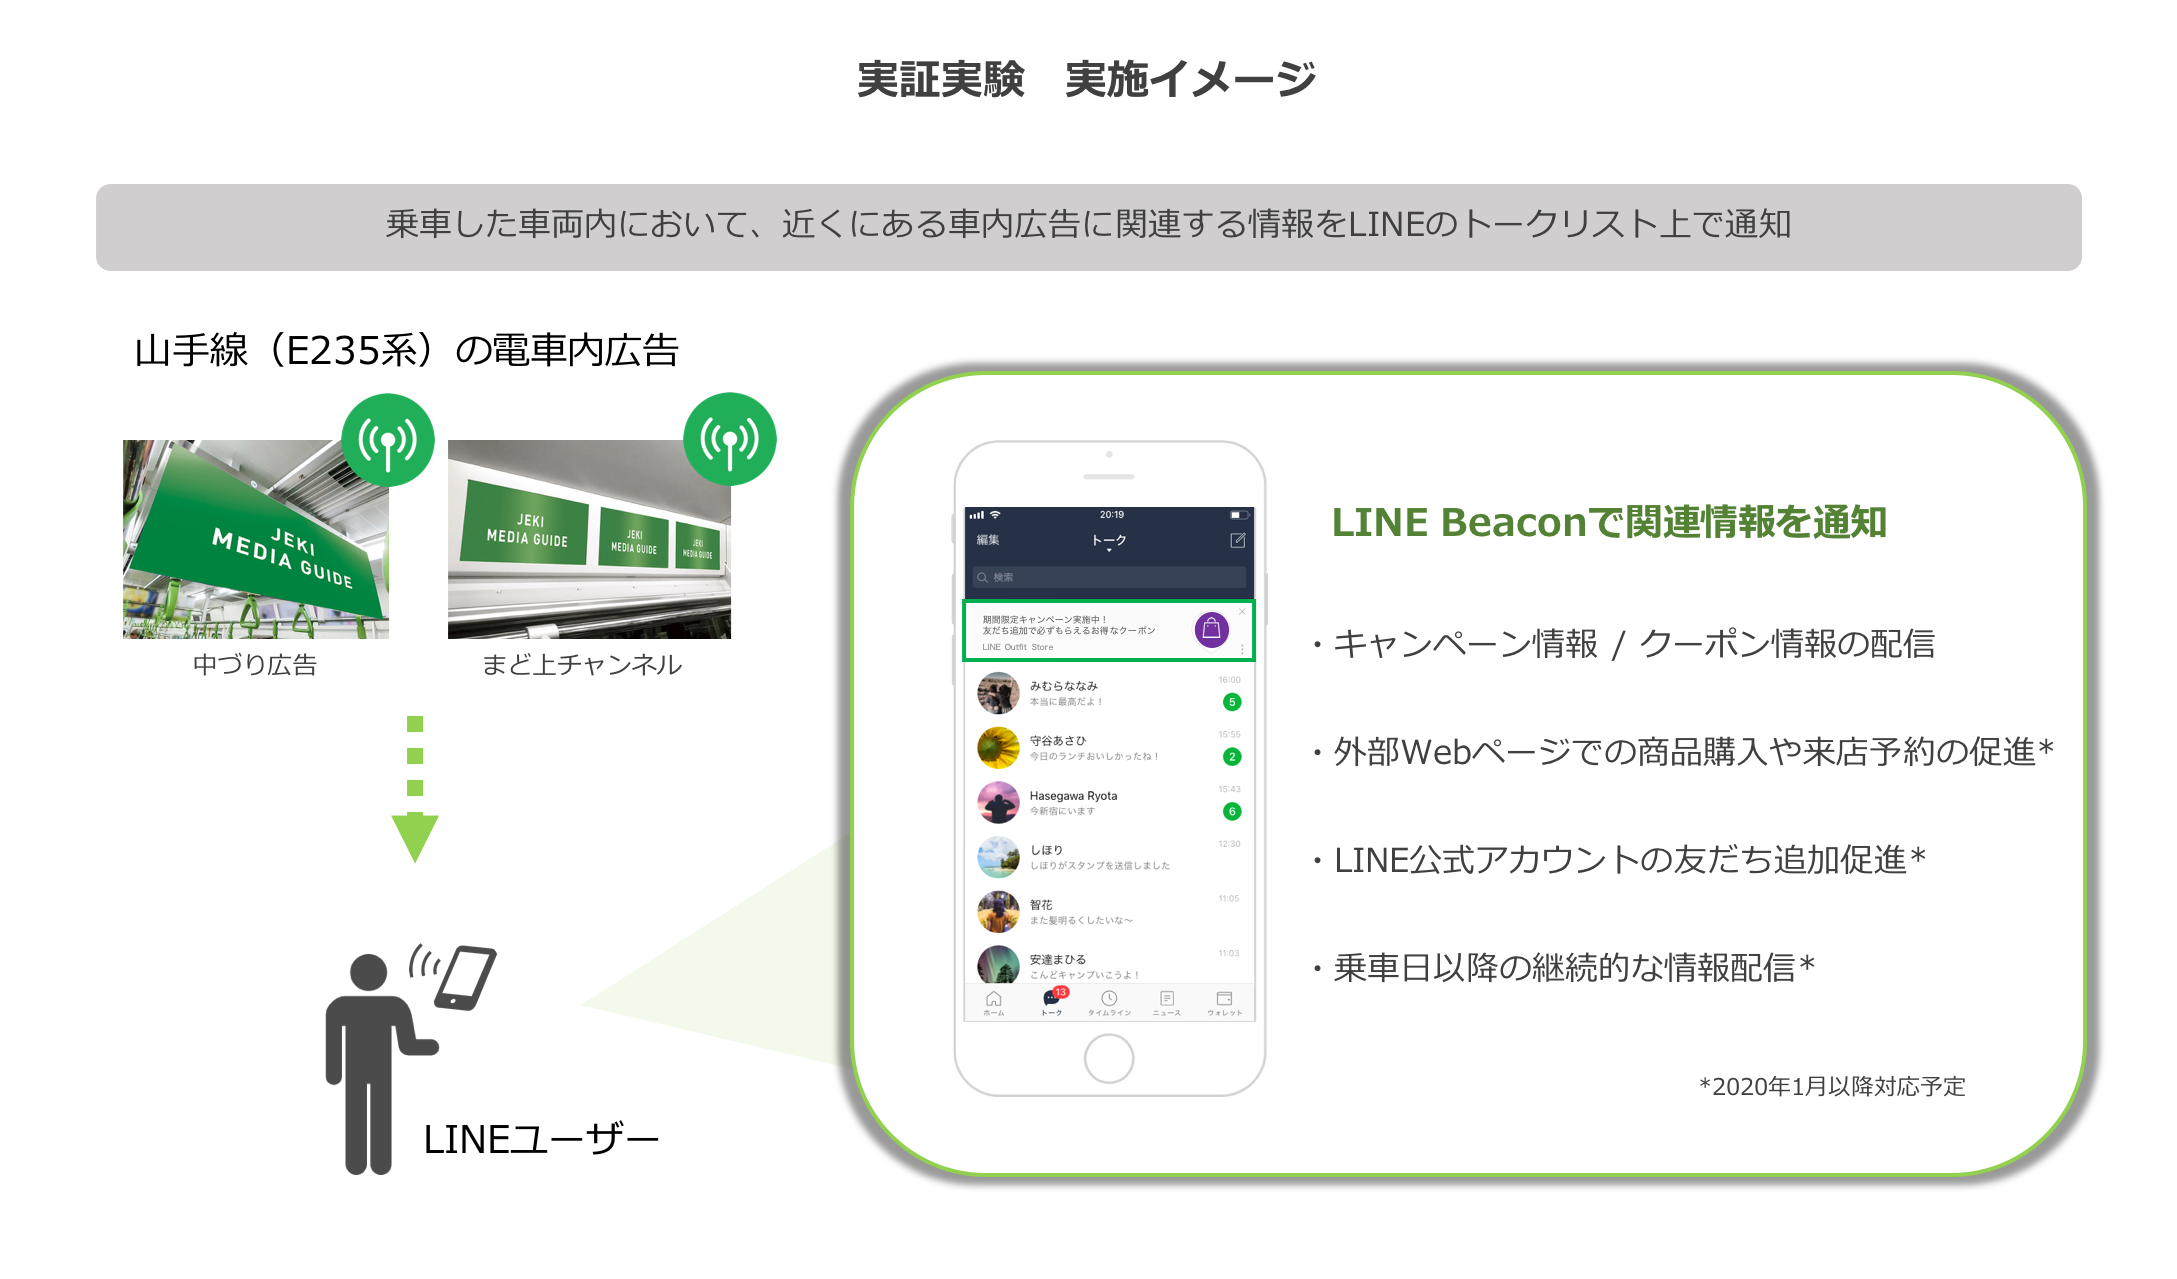 LINE、ジェイアール東日本企画と電車内広告の閲覧・視聴におけるユーザー体験の向上を目指す実証実験を開始